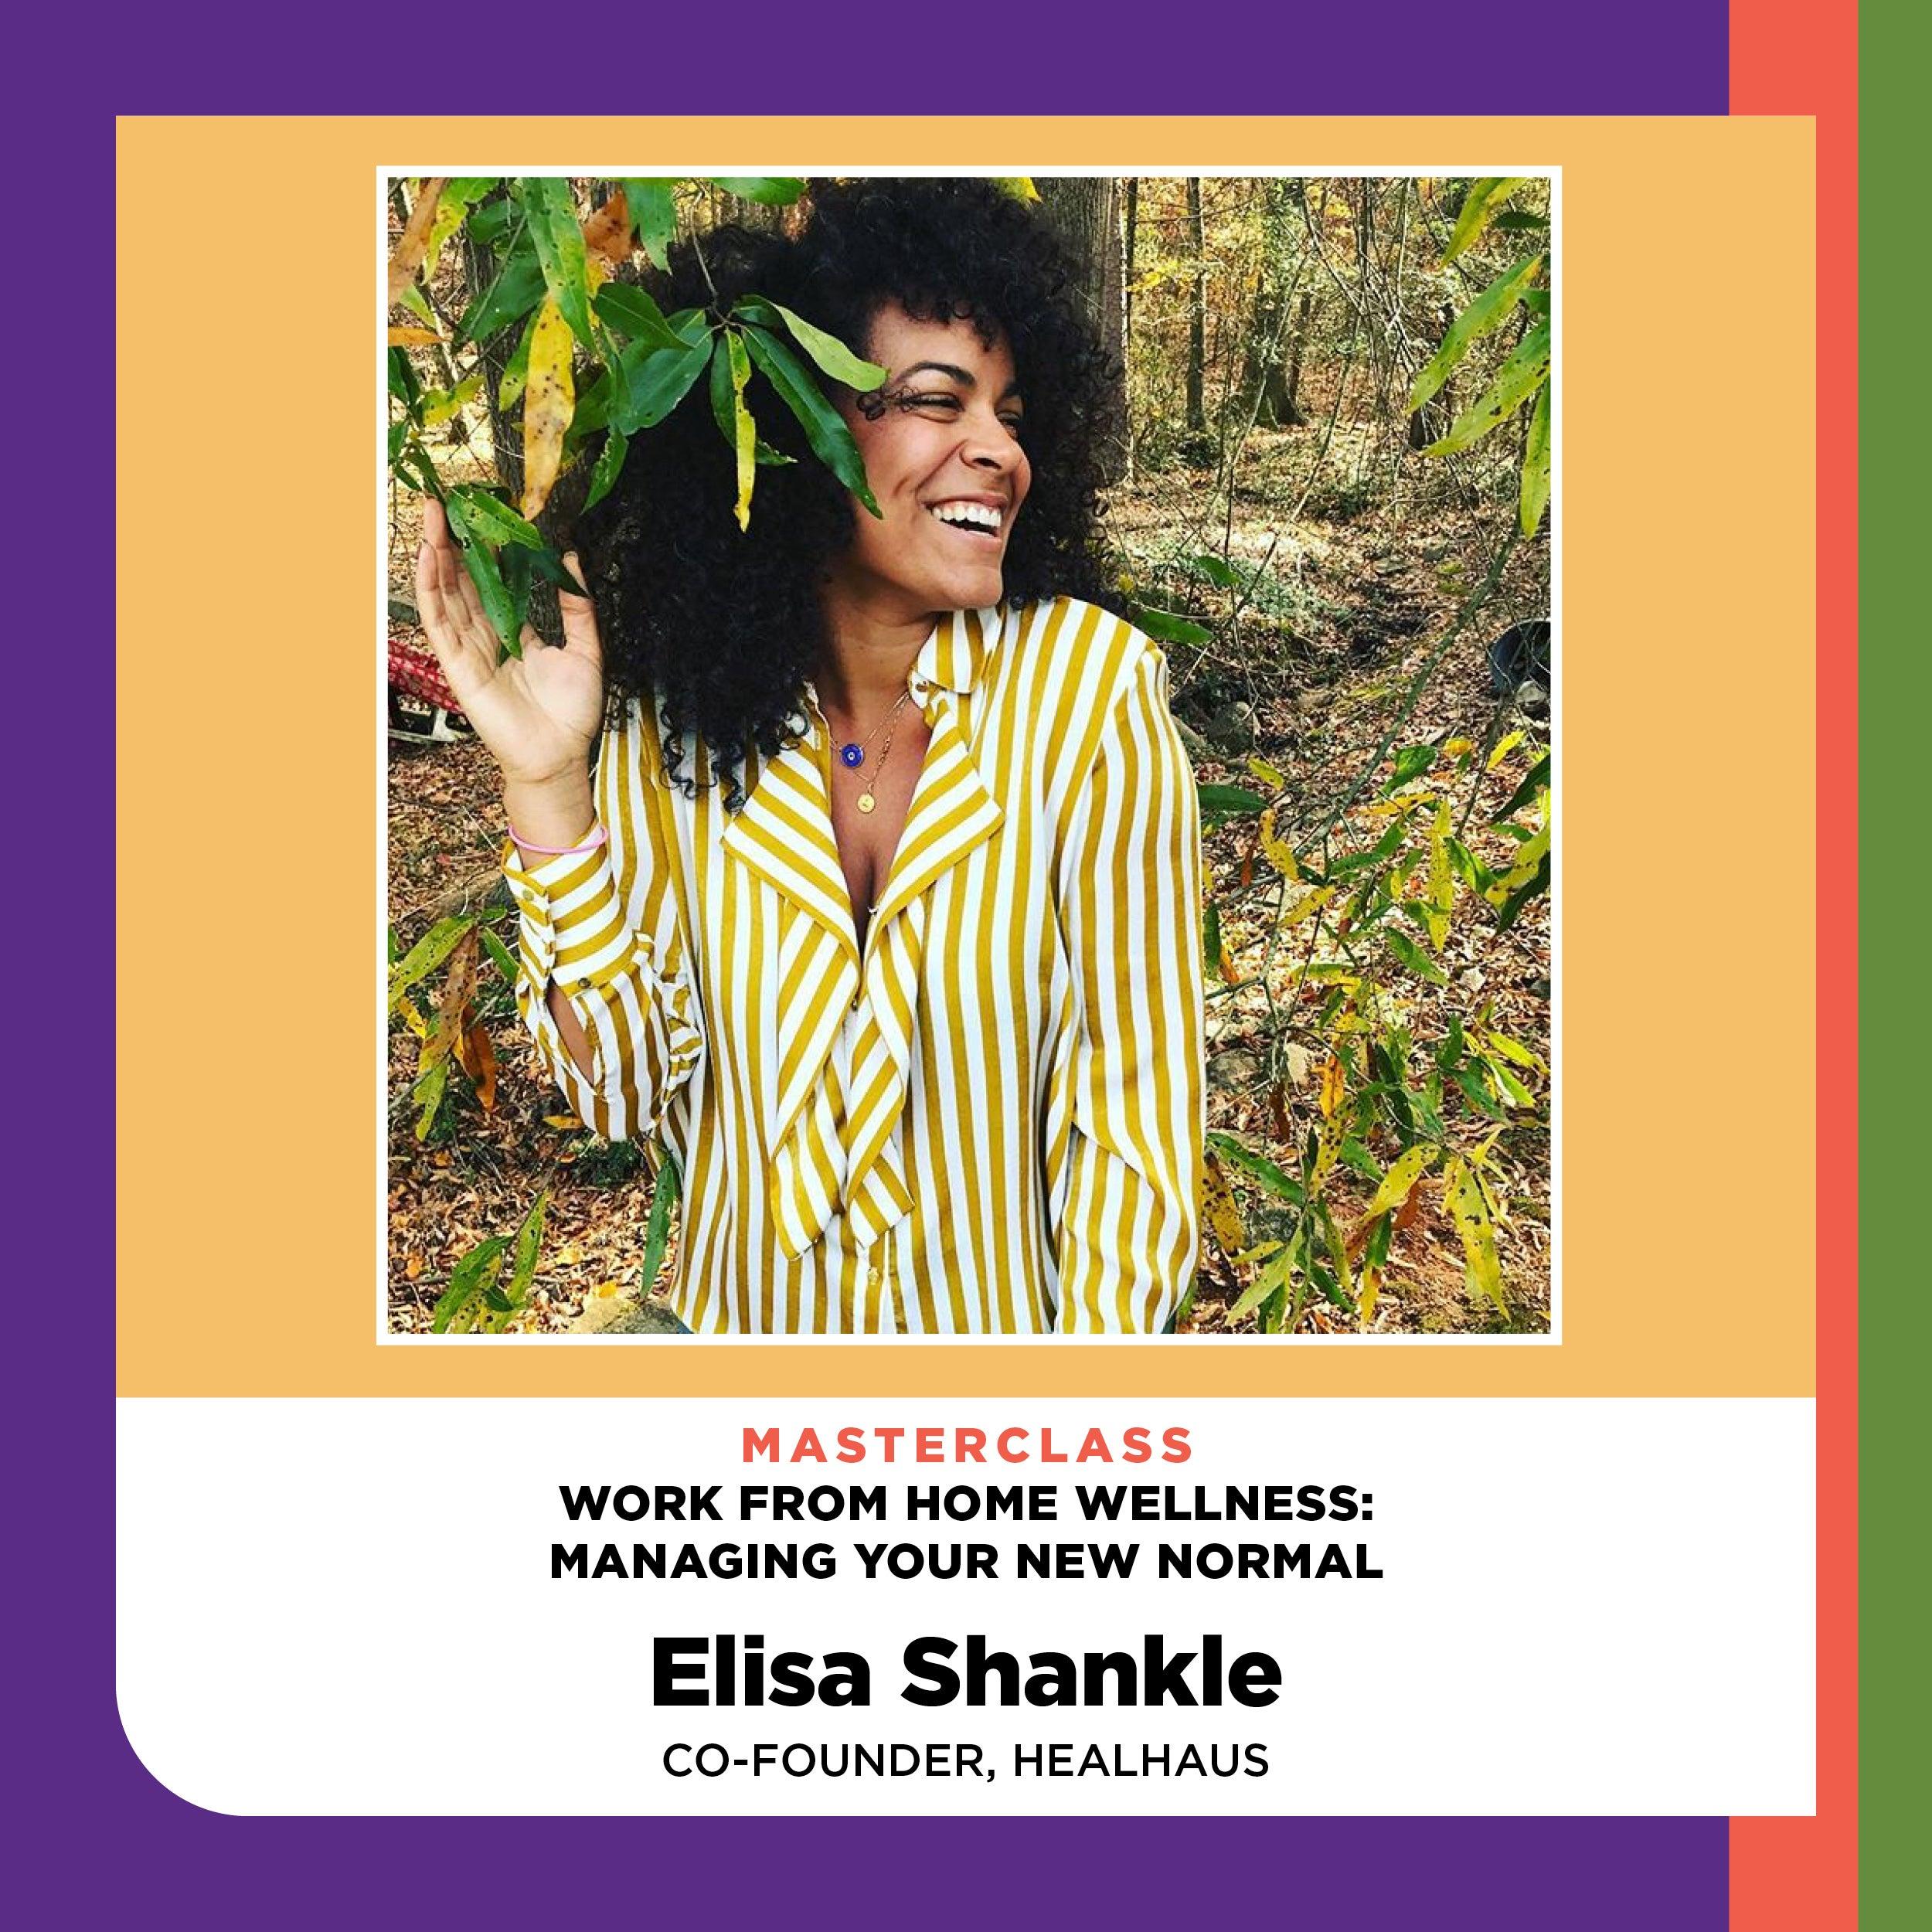 Elisa Shankle